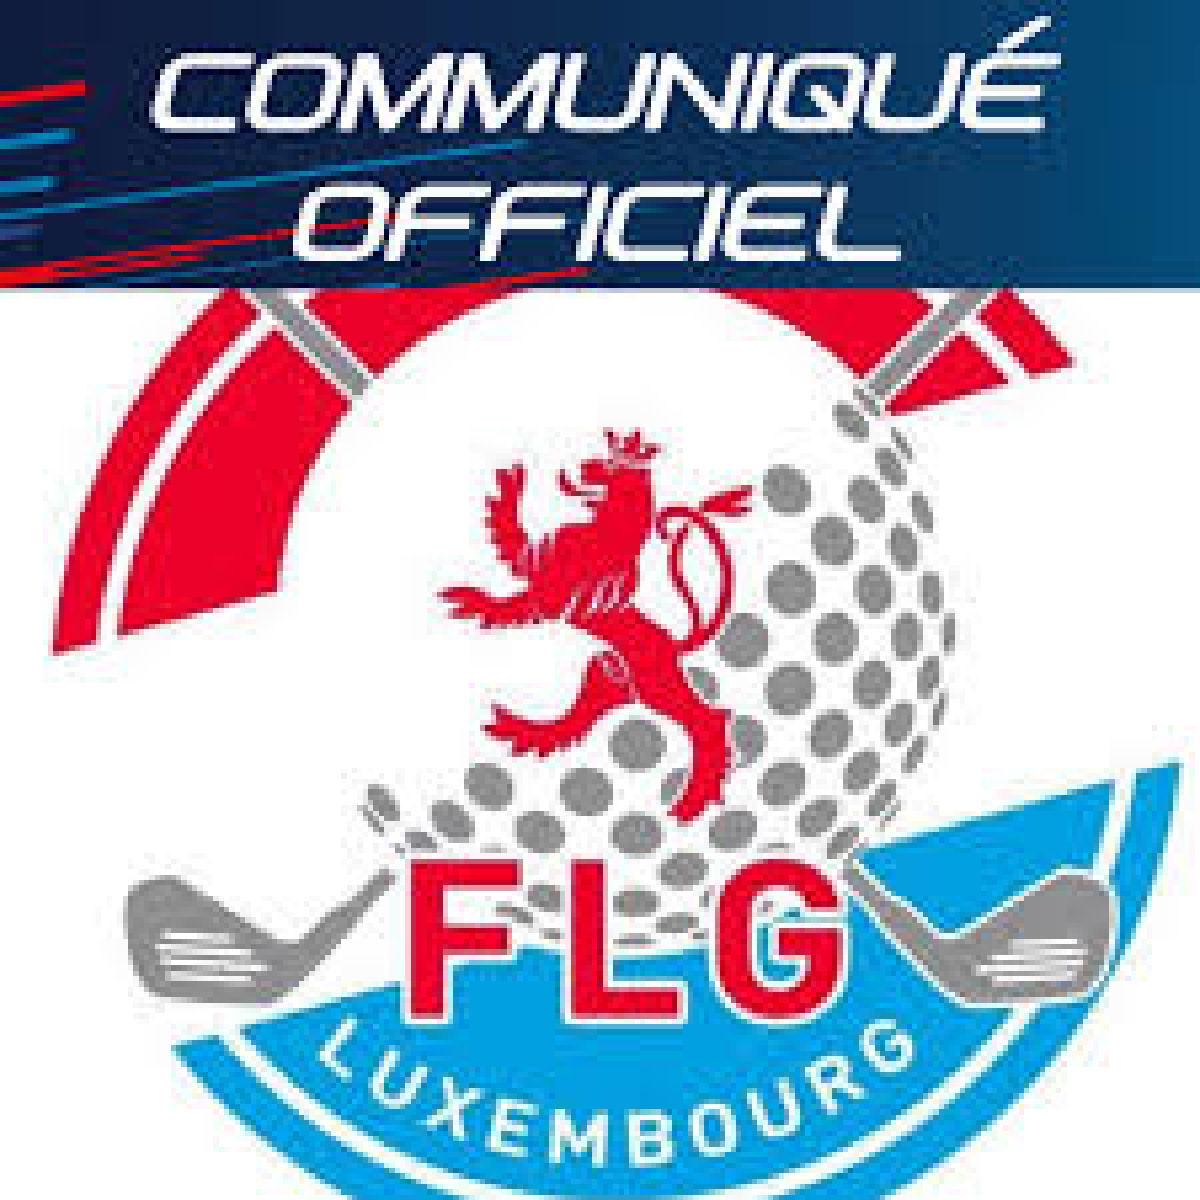 Communiqué du 03.08.2021 - Christnach Golf Club